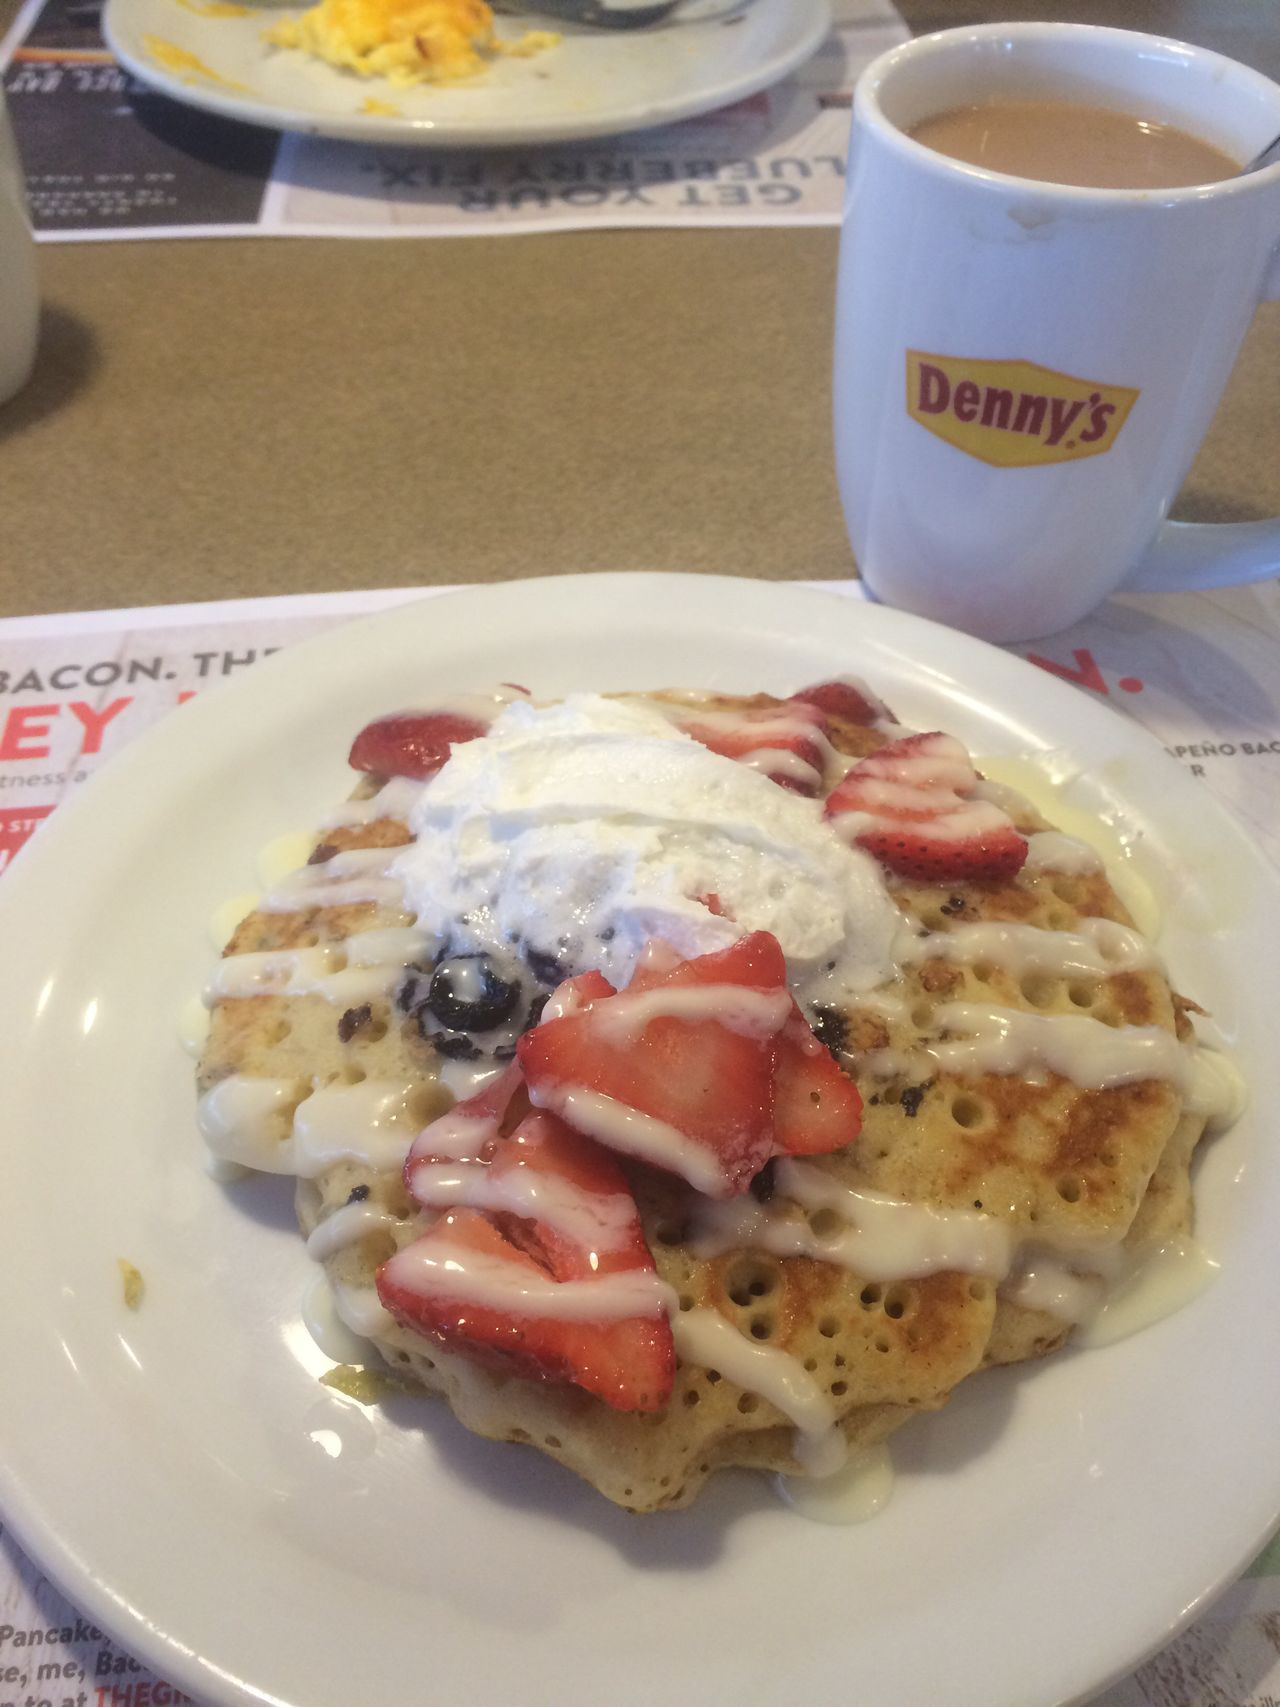 Denny's Breakfast ♥ Pancakes Hello World Tasty Unhealthy Loveit♥ Strawberry Blueberry Eyeem Food  Lifestyle